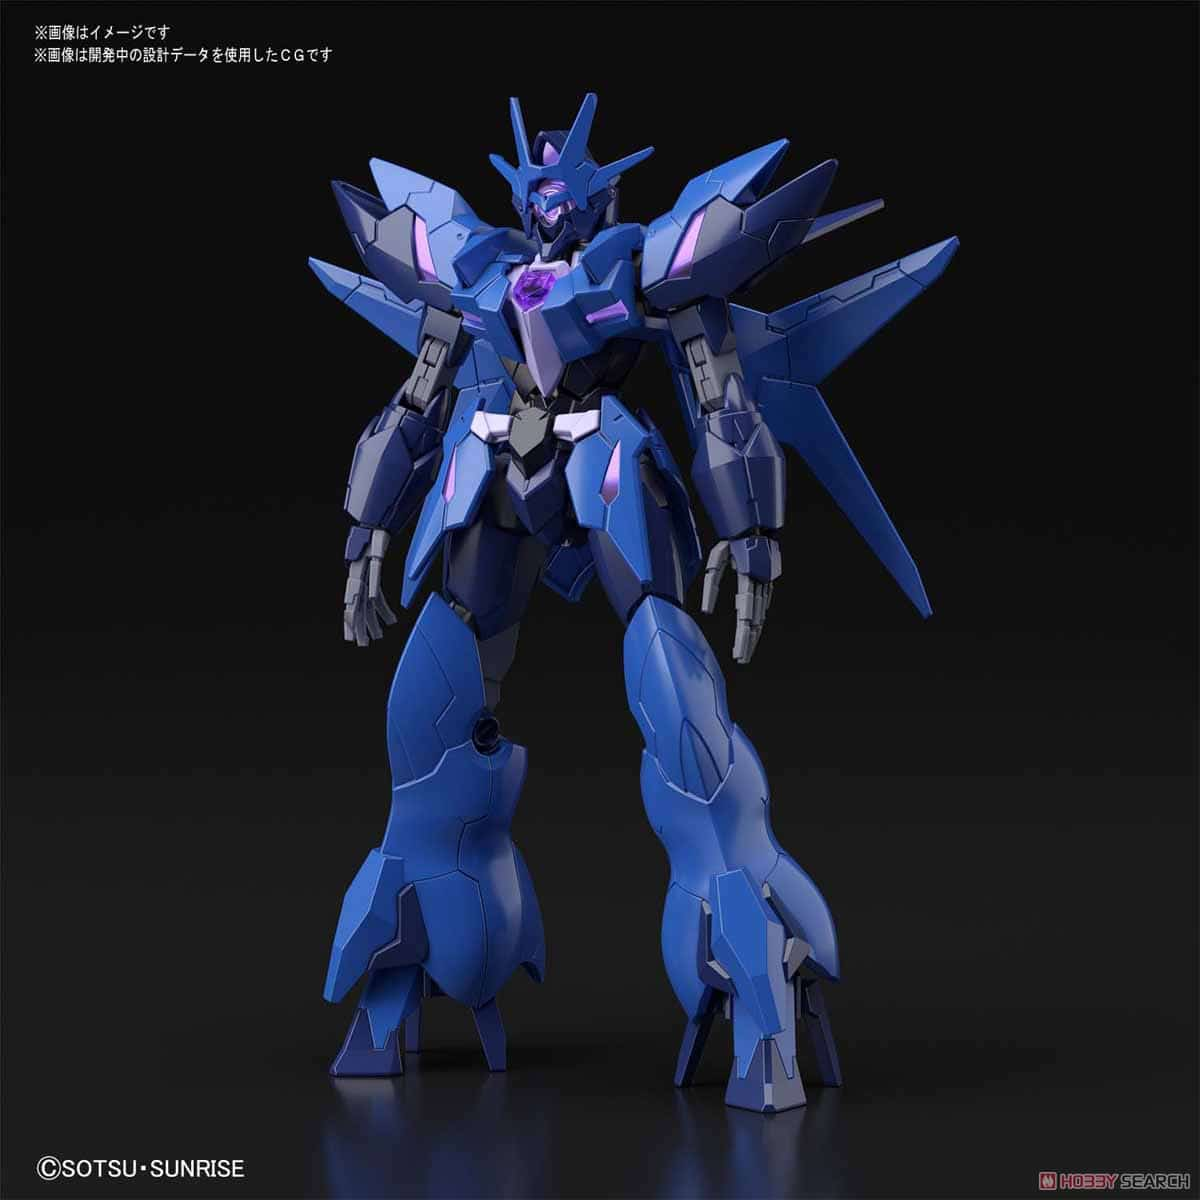 High Grade Enemy Gundam - Tentative Pose 2